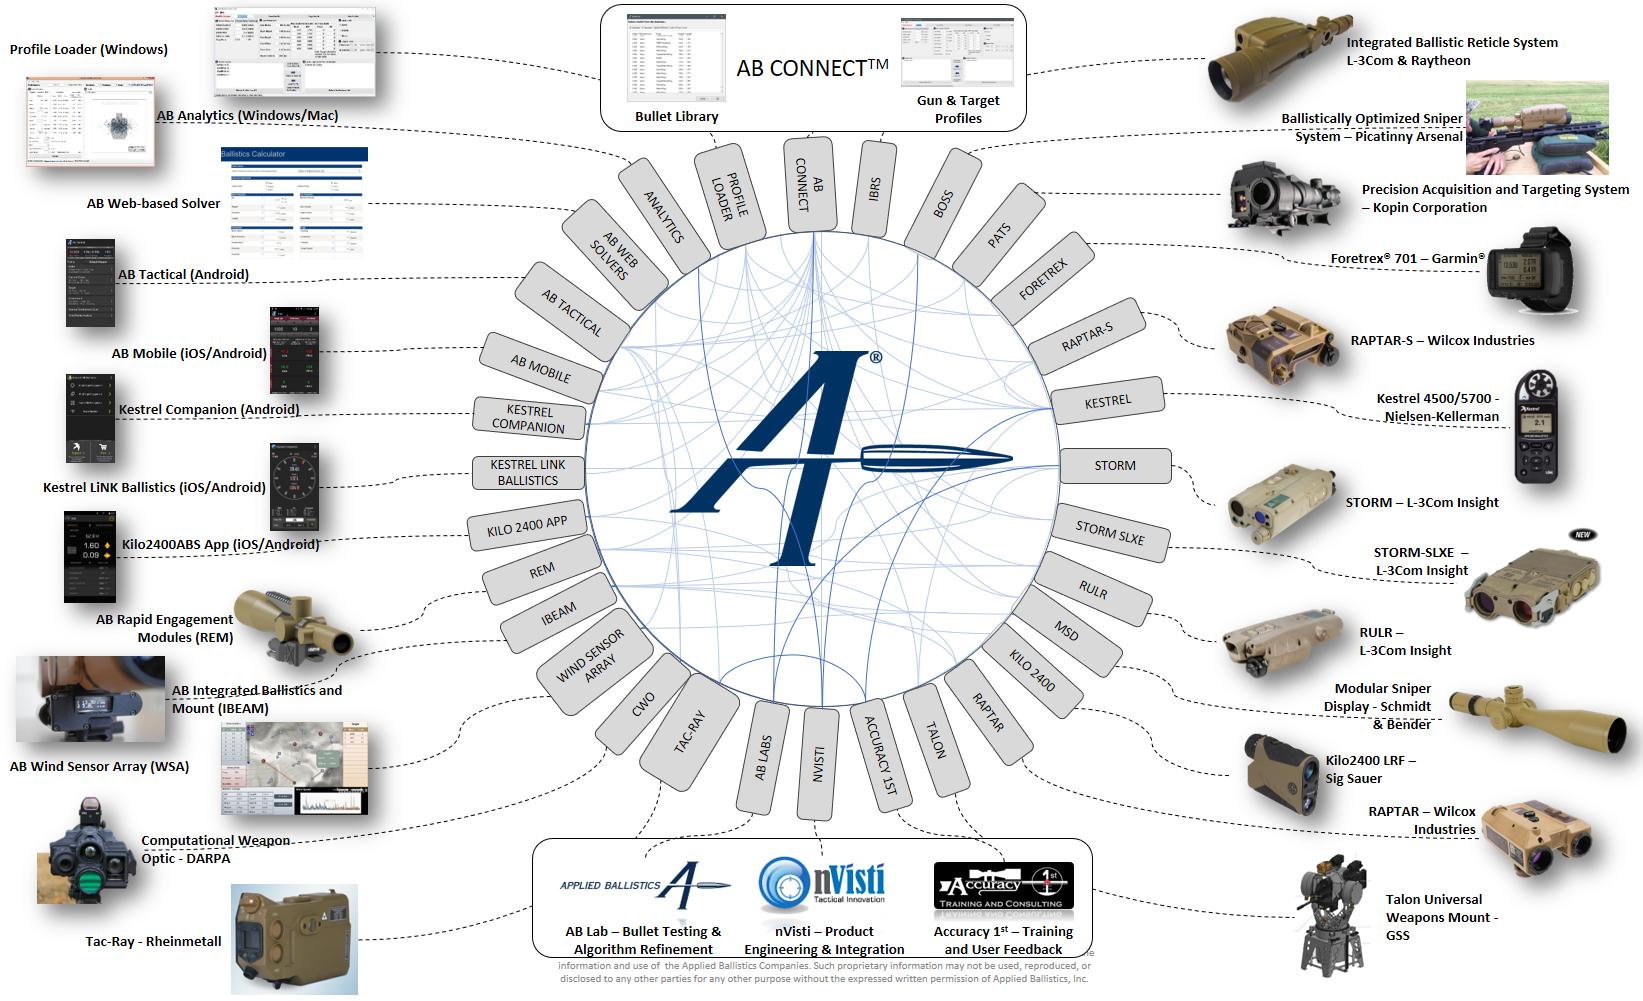 Applied Ballistics tools for custom drag models